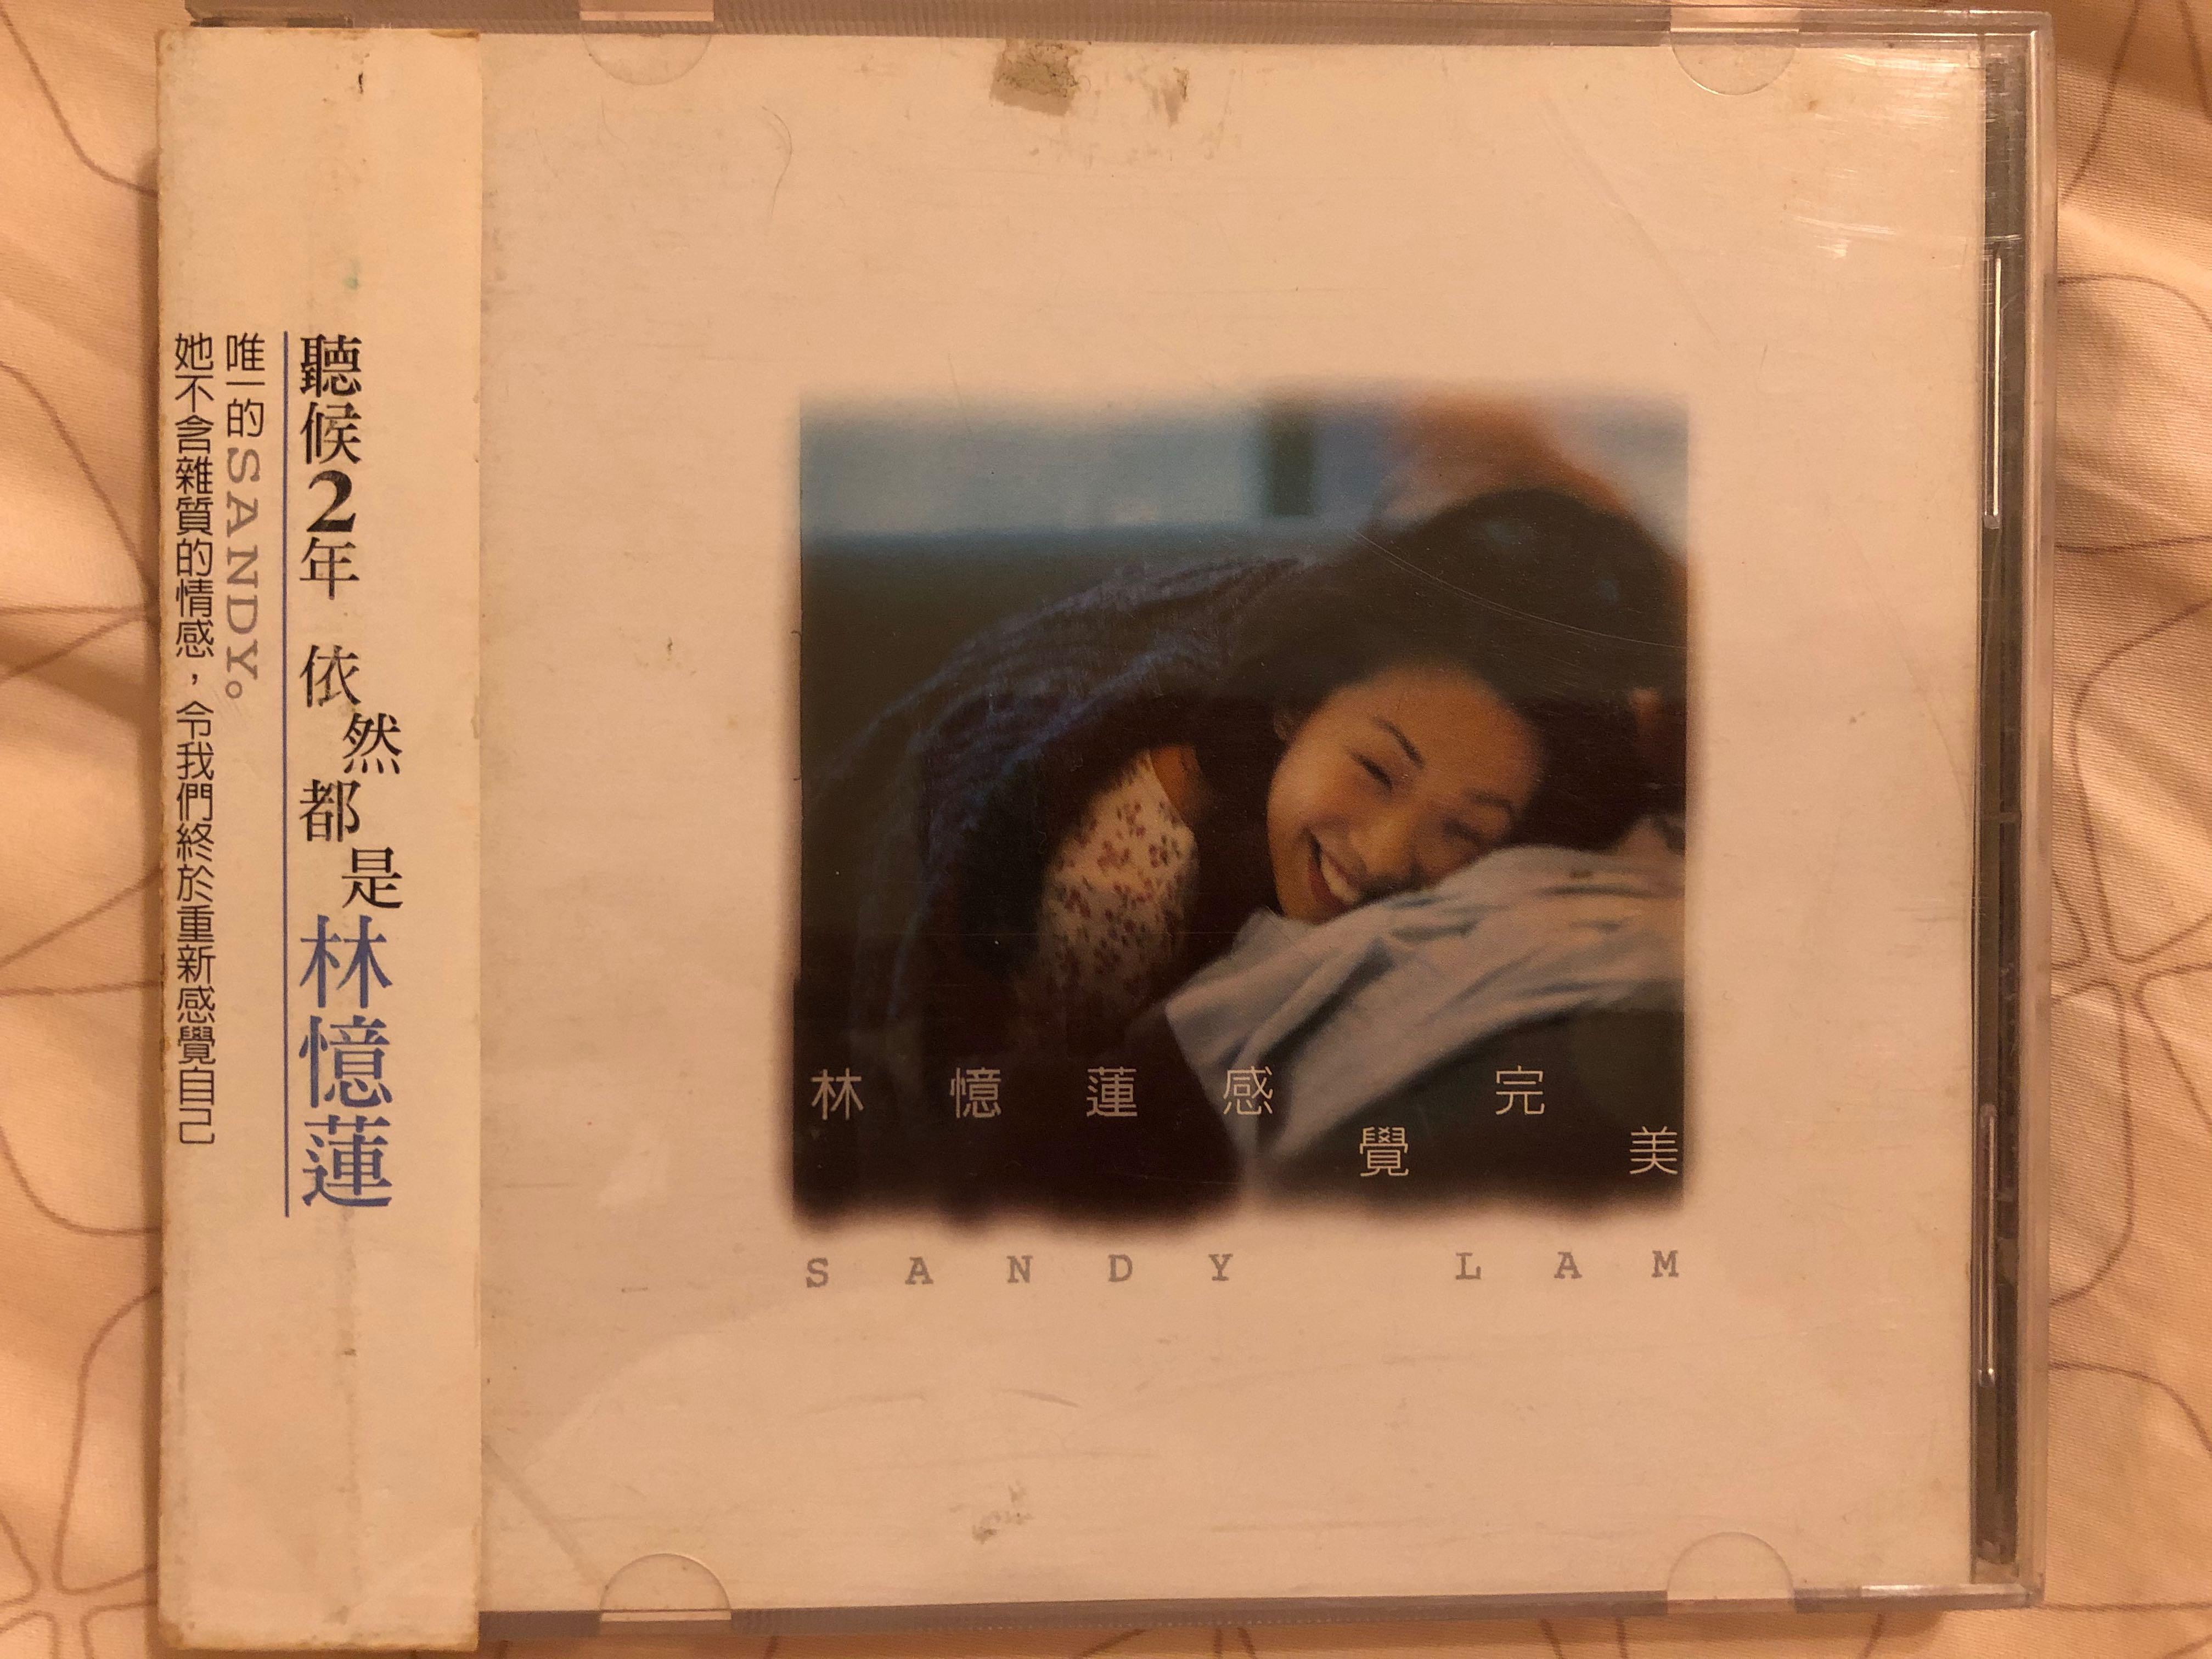 CD:林憶蓮 感覺完美 Sandy Lam Feeling Perfect